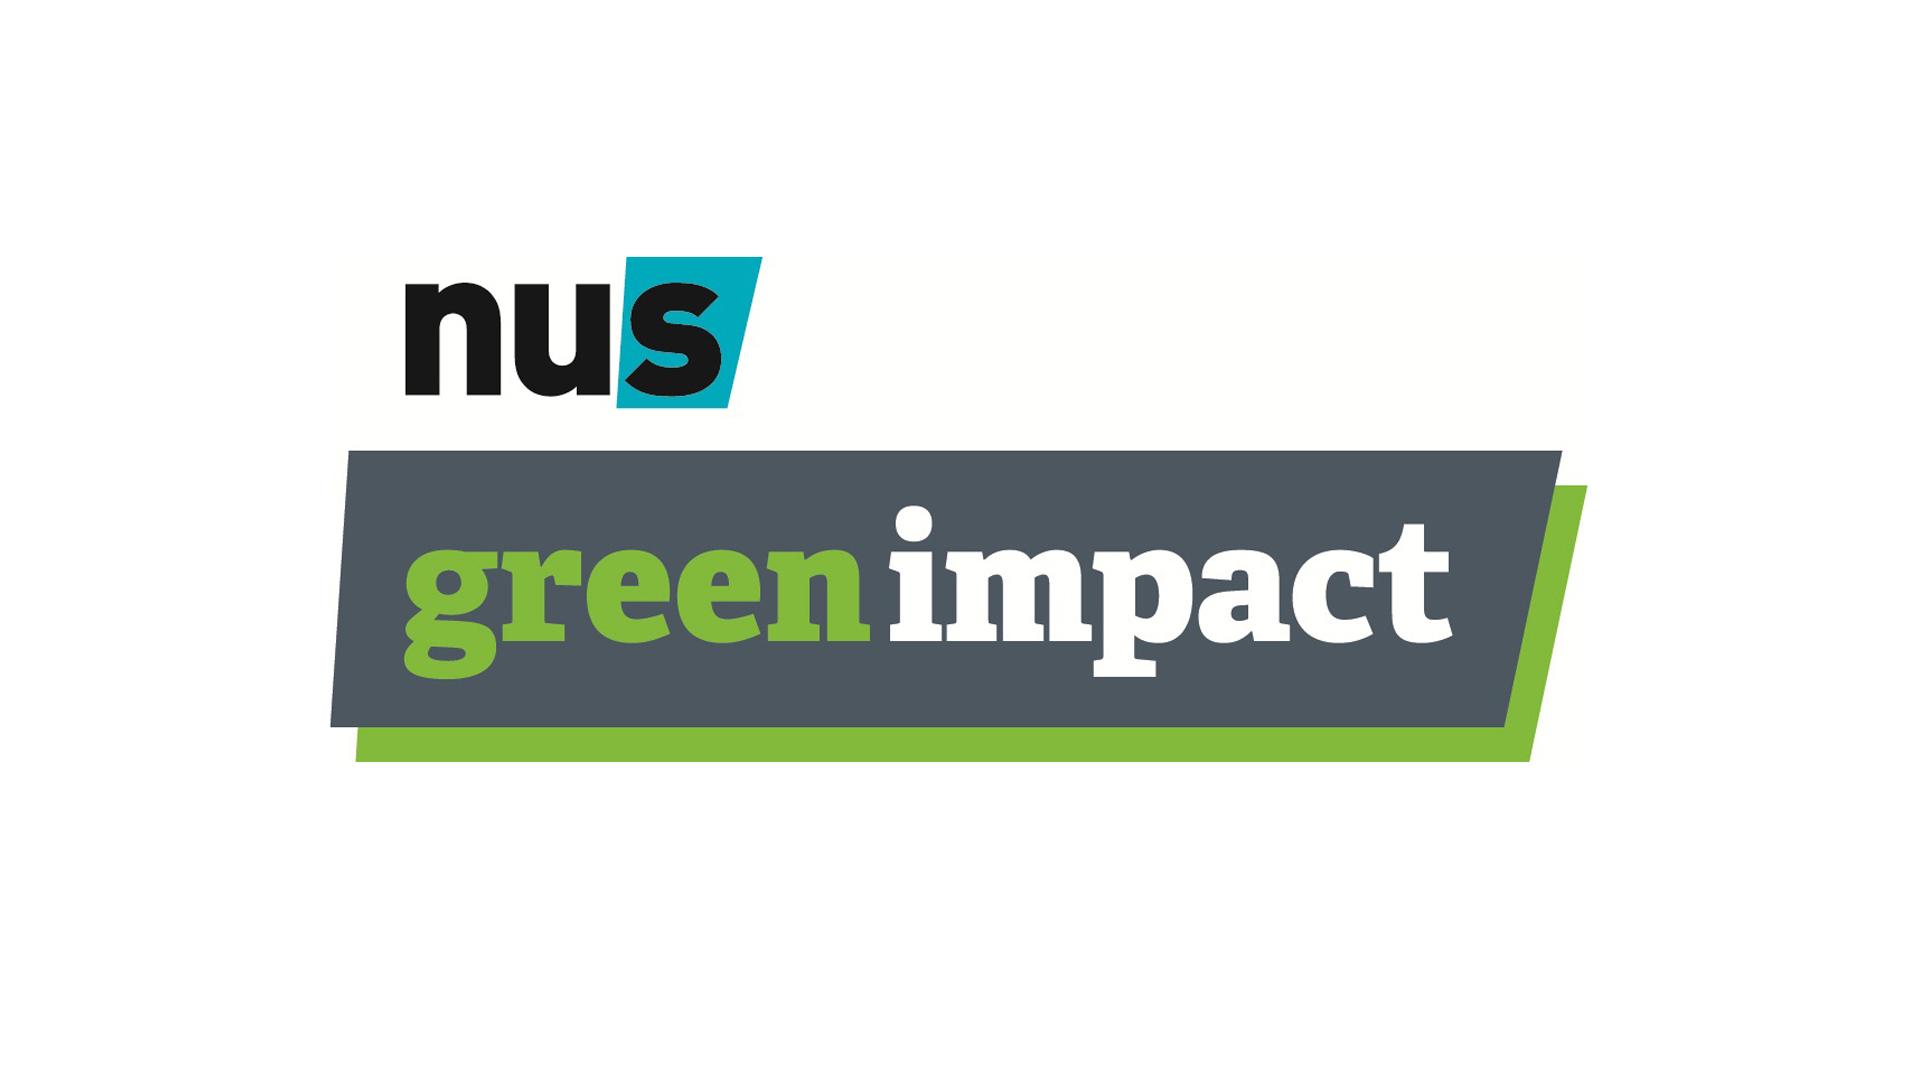 img-rose-news-2020-green-impact-awards